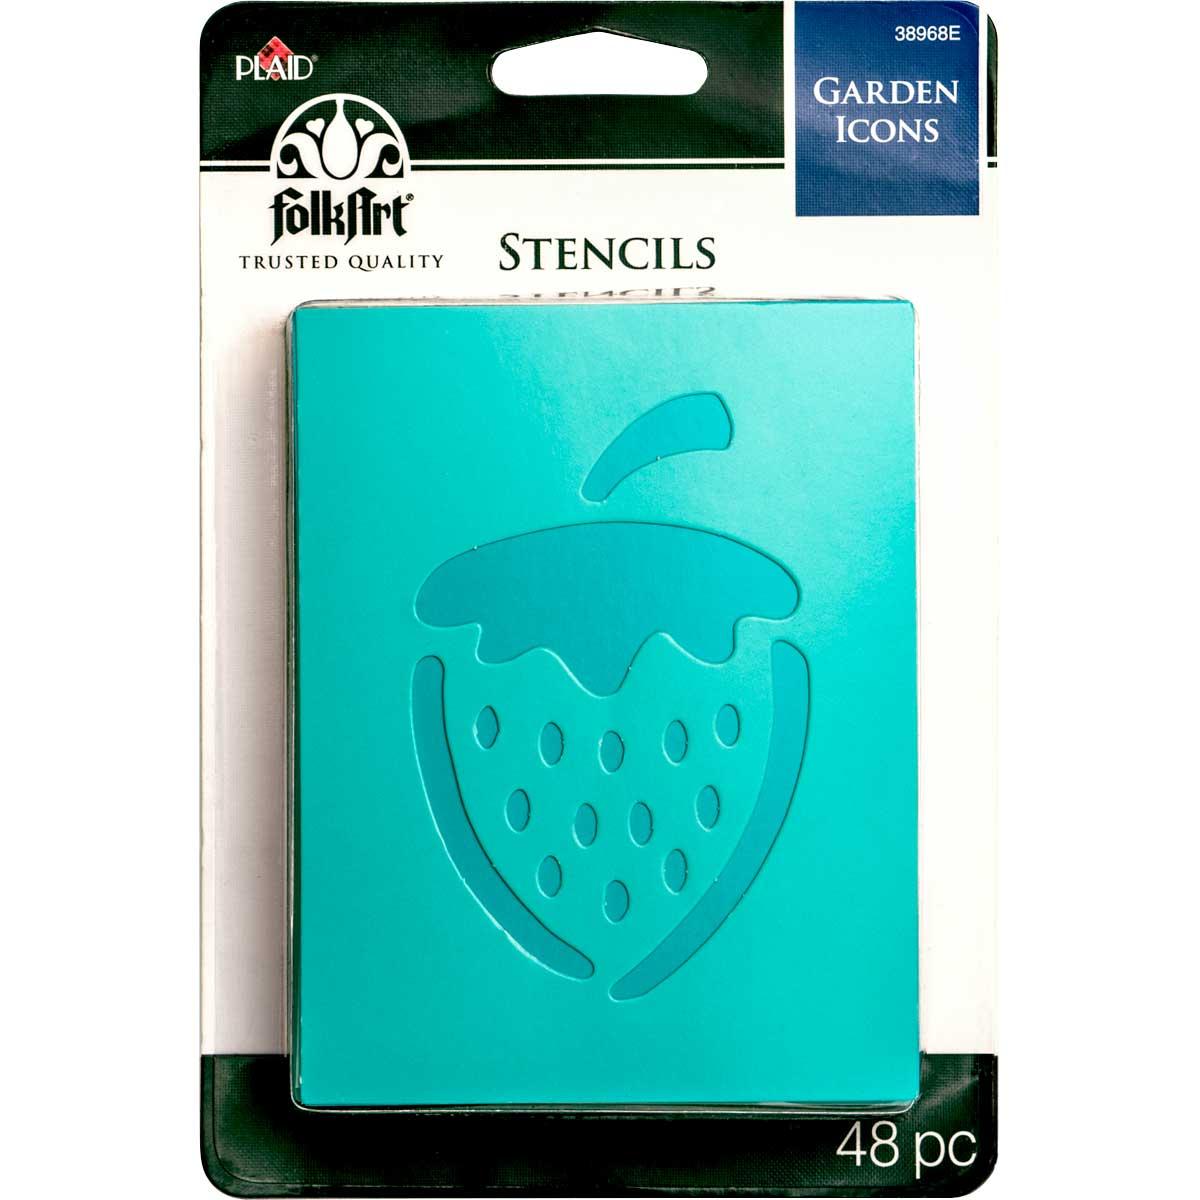 FolkArt ® Stencil Value Packs - Garden Icons